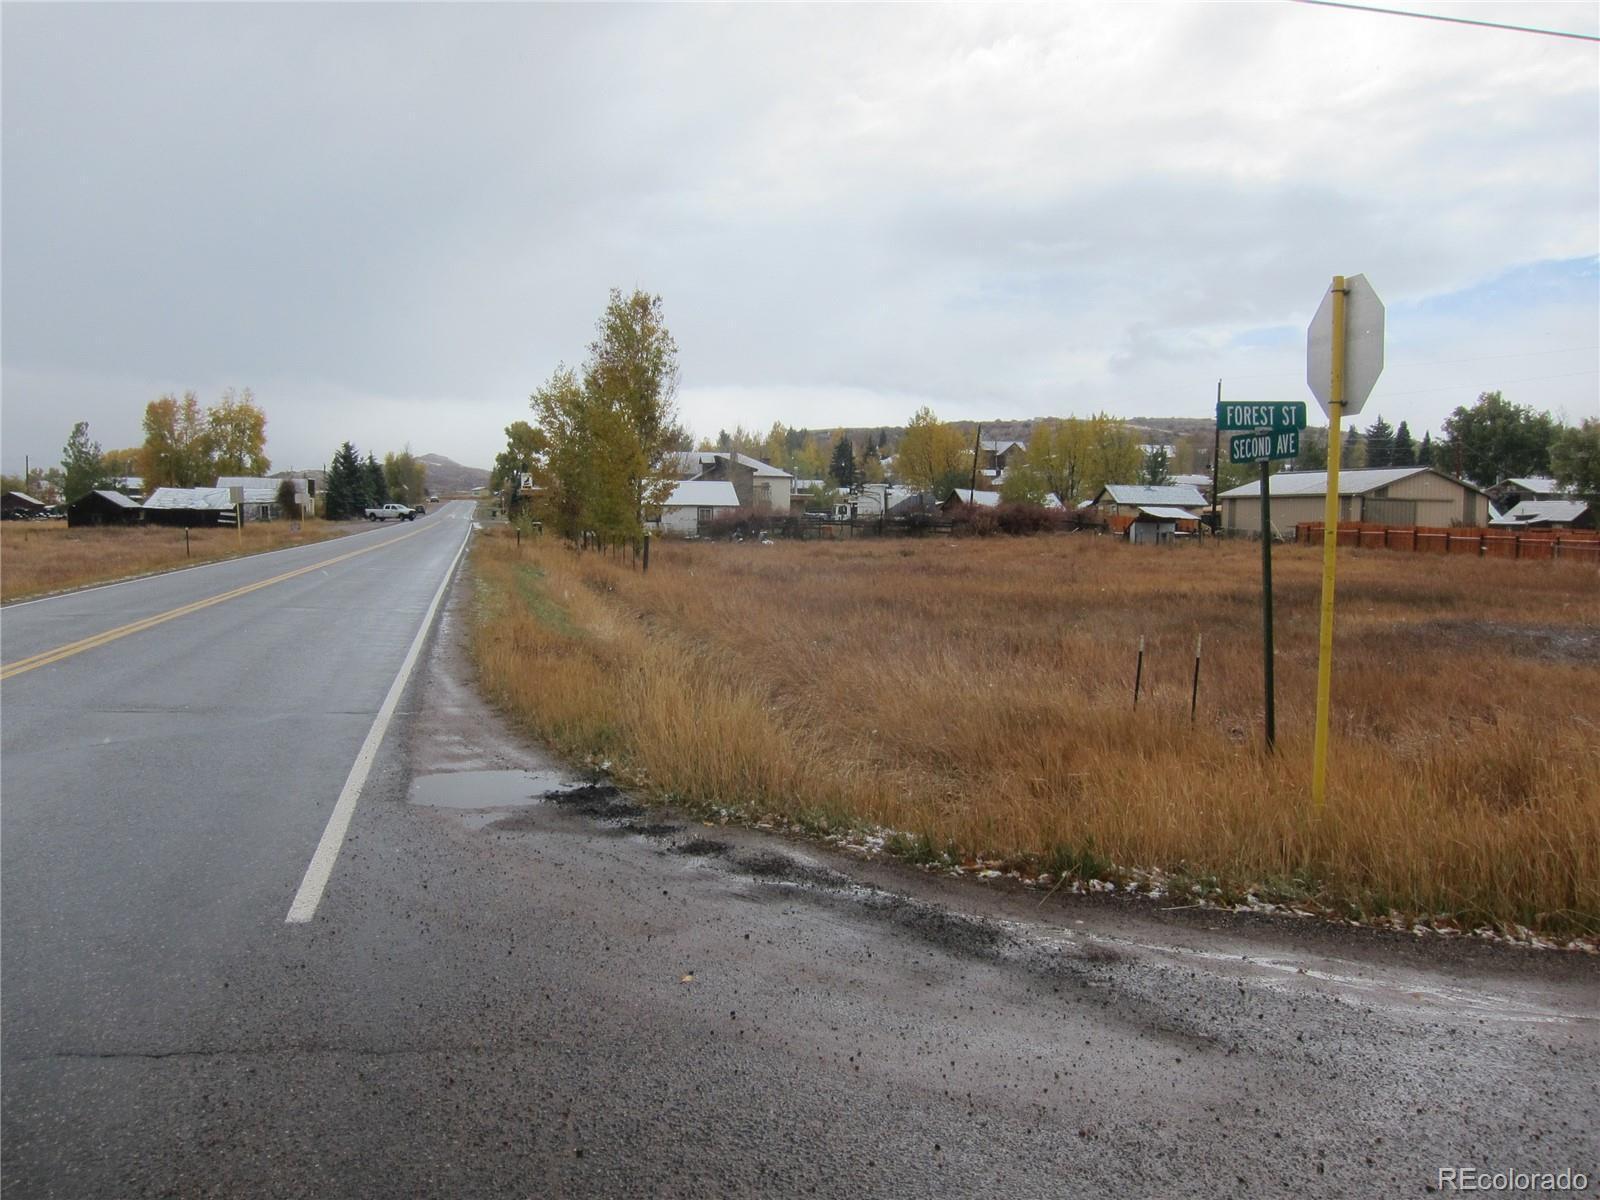 TBD Highway 131 photo